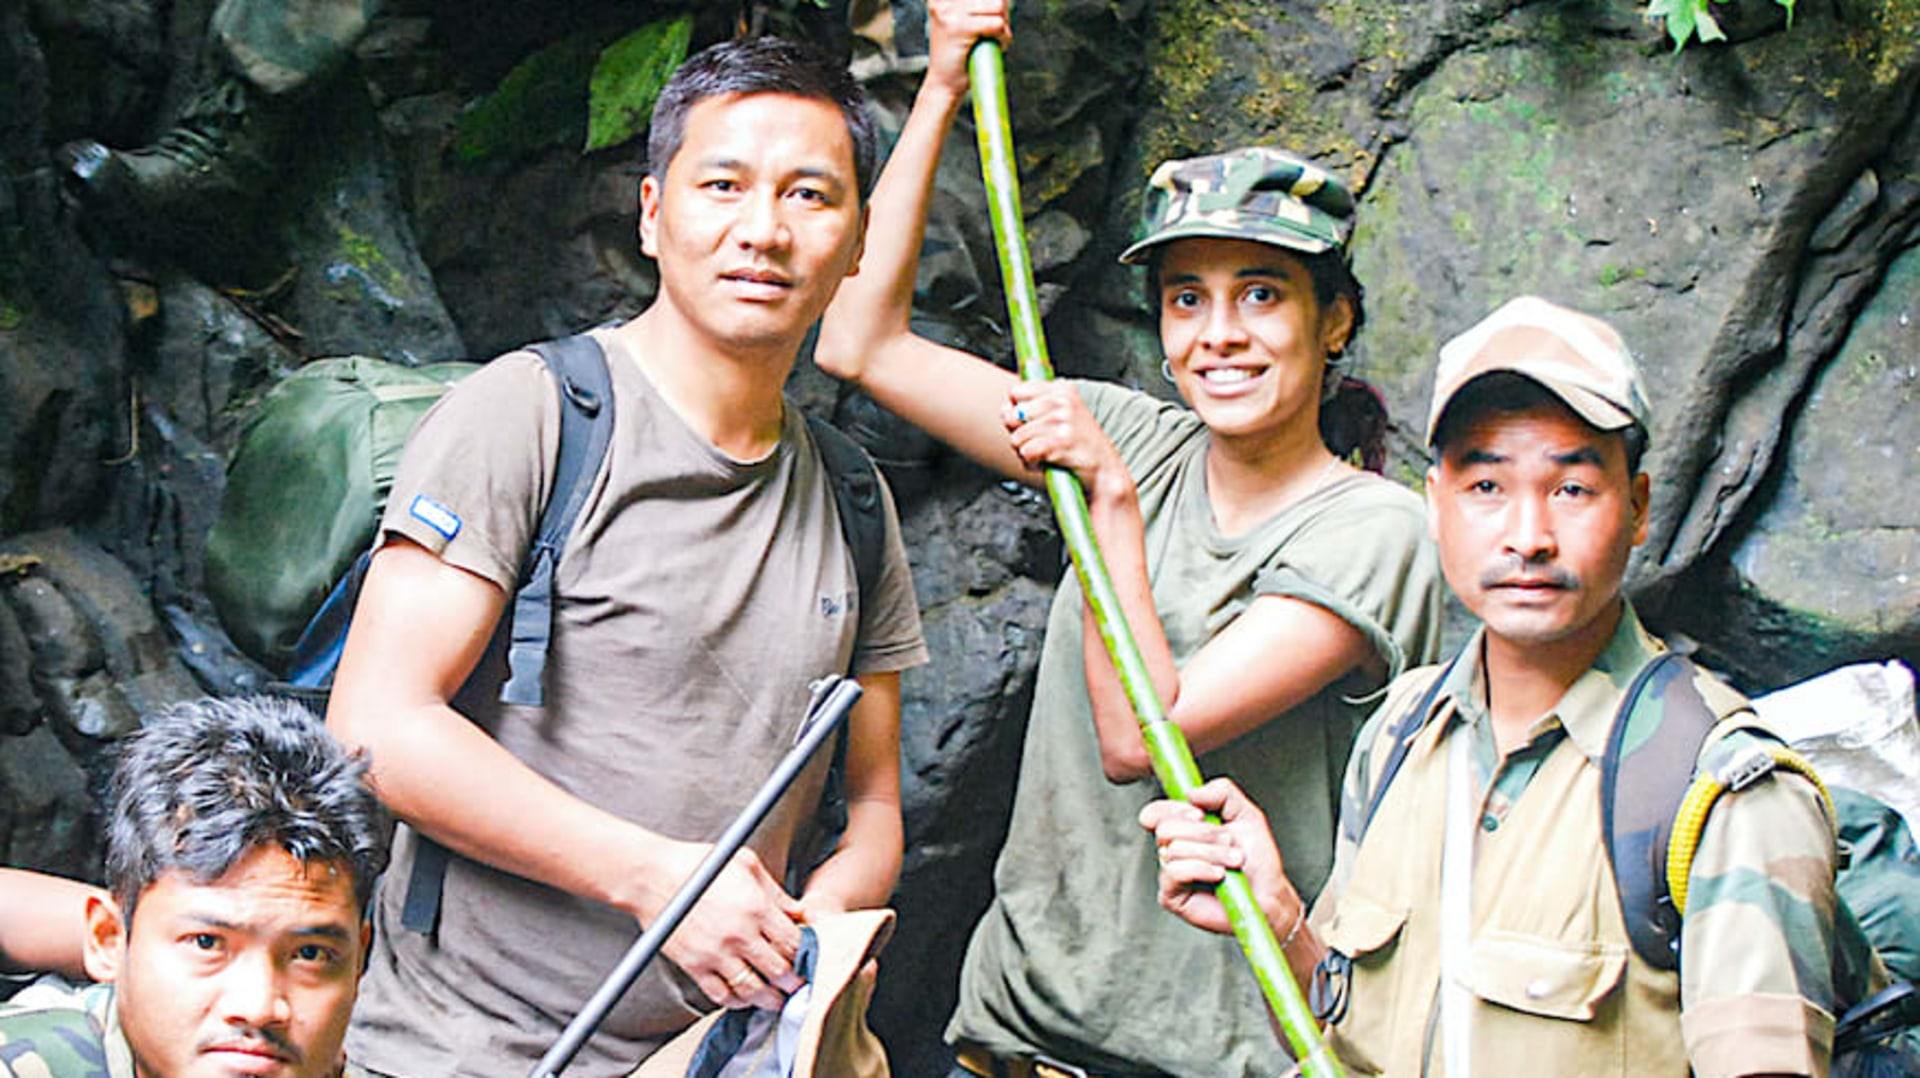 Nandini Velho: Community and Conservation